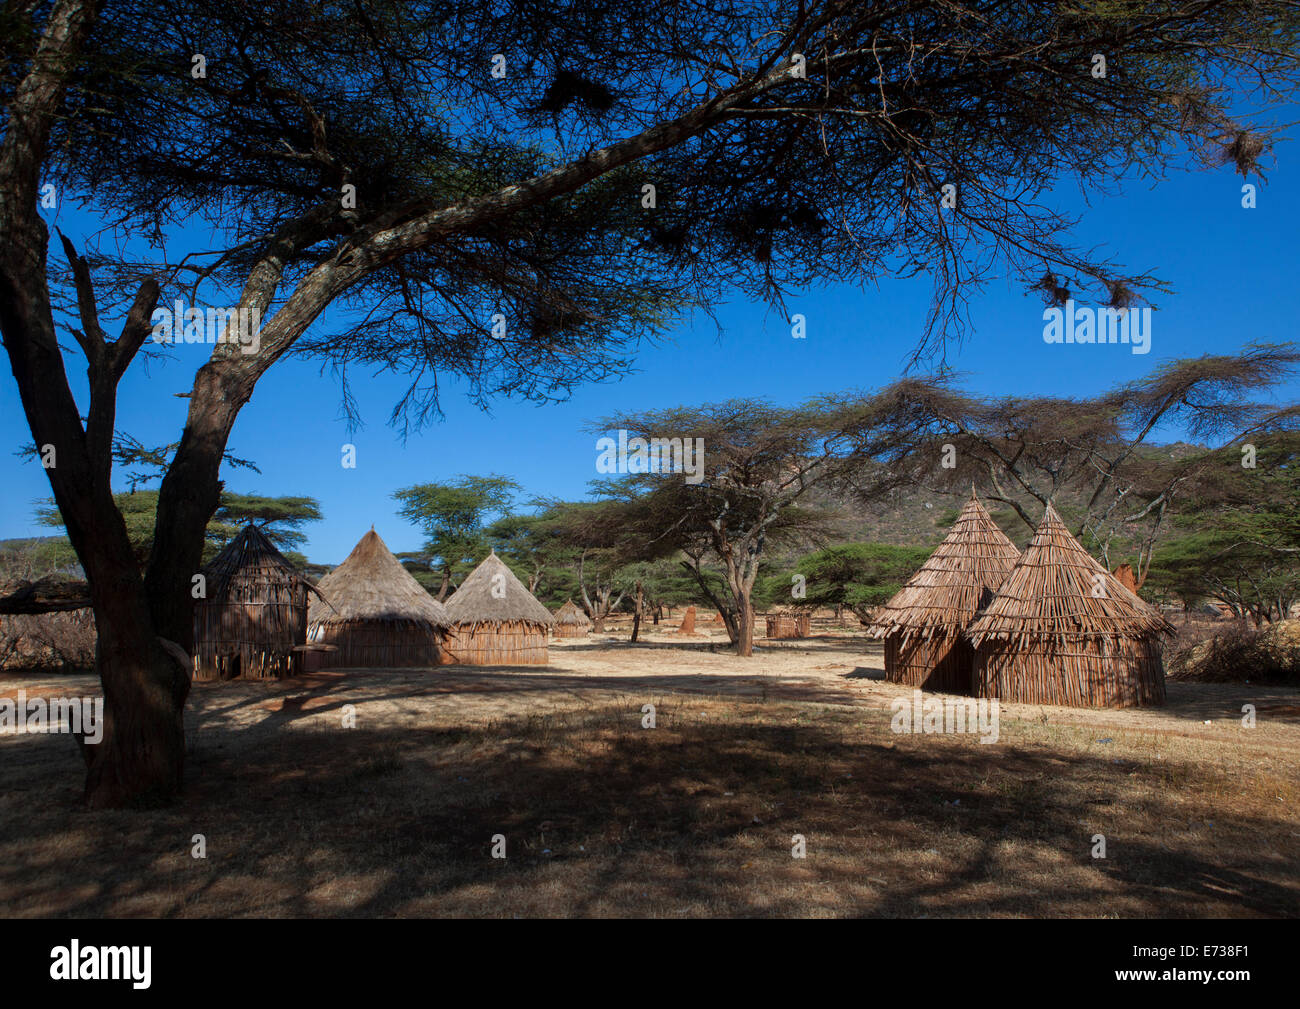 Traditional Village In Borana Tribe, Ola Alakadjilo, Ethiopia - Stock Image